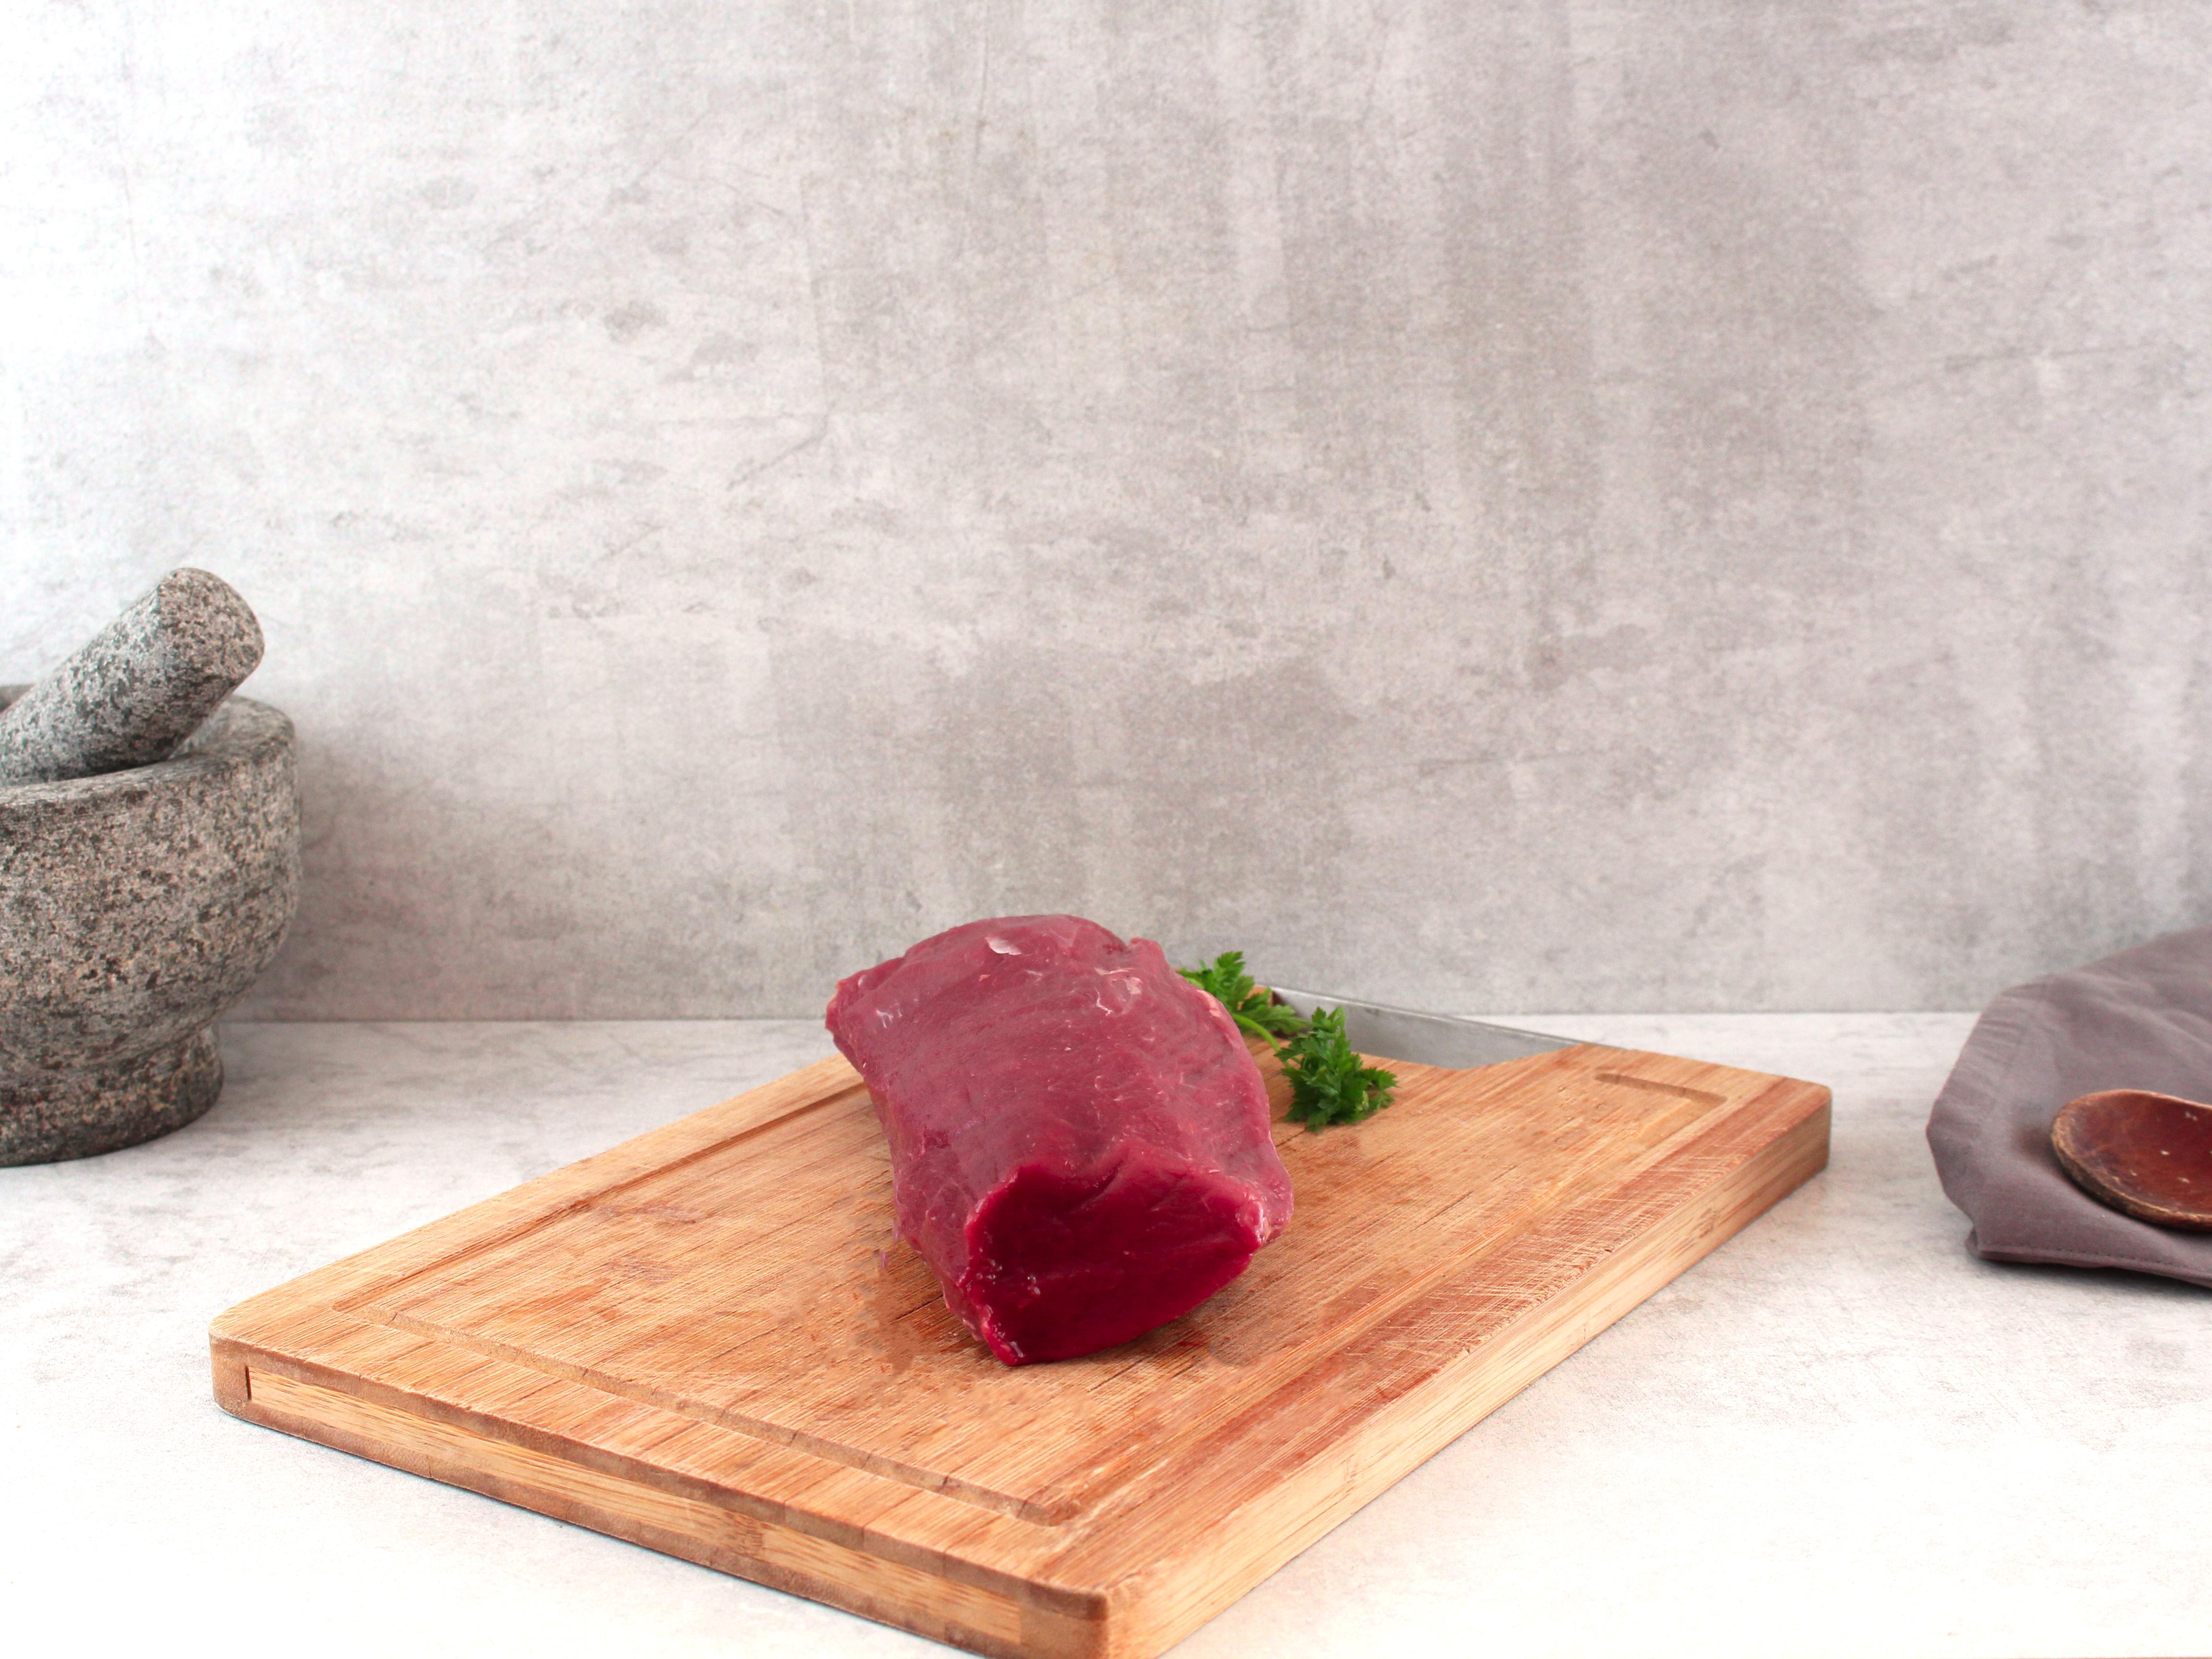 mh20-bueffel-filet-center-cut-ca.-600-g---stk.-italien-markthalle20-1